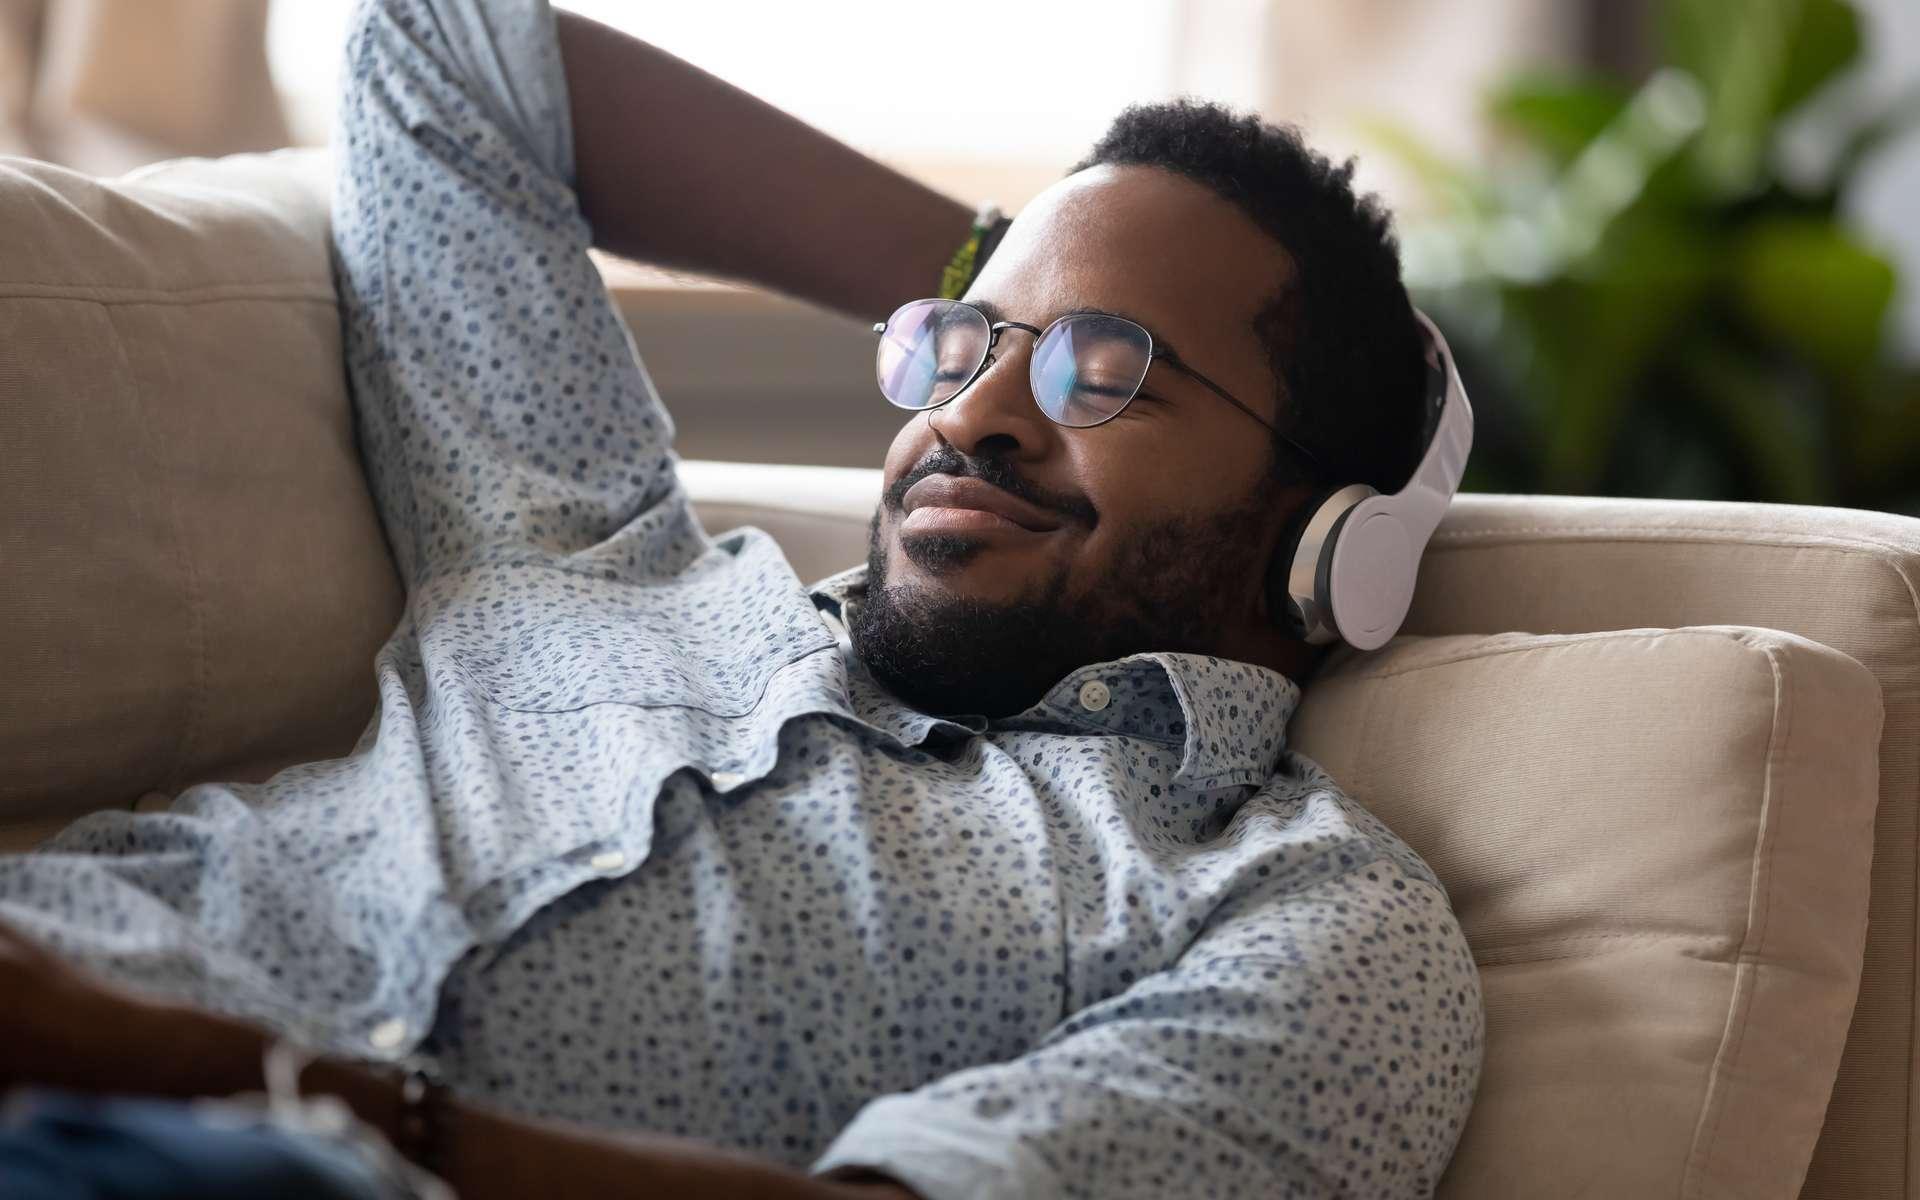 Déjà cinq podcasts Futura à écouter cet été ! © Konstantin Savusia, Adobe Stock